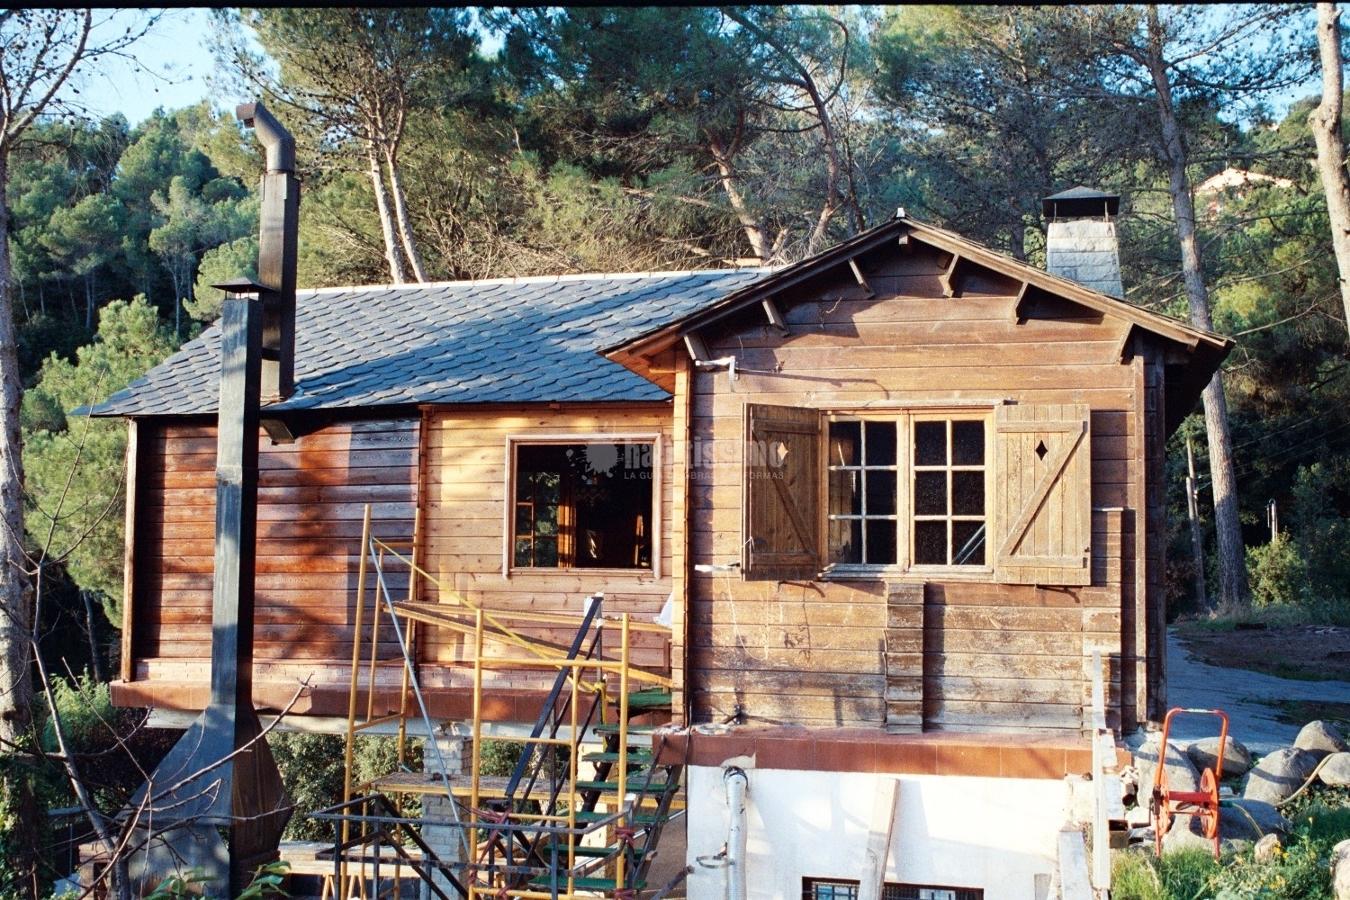 Rehabilitaci n y restauraci n de casas de madera ideas - Restauracion de casas ...